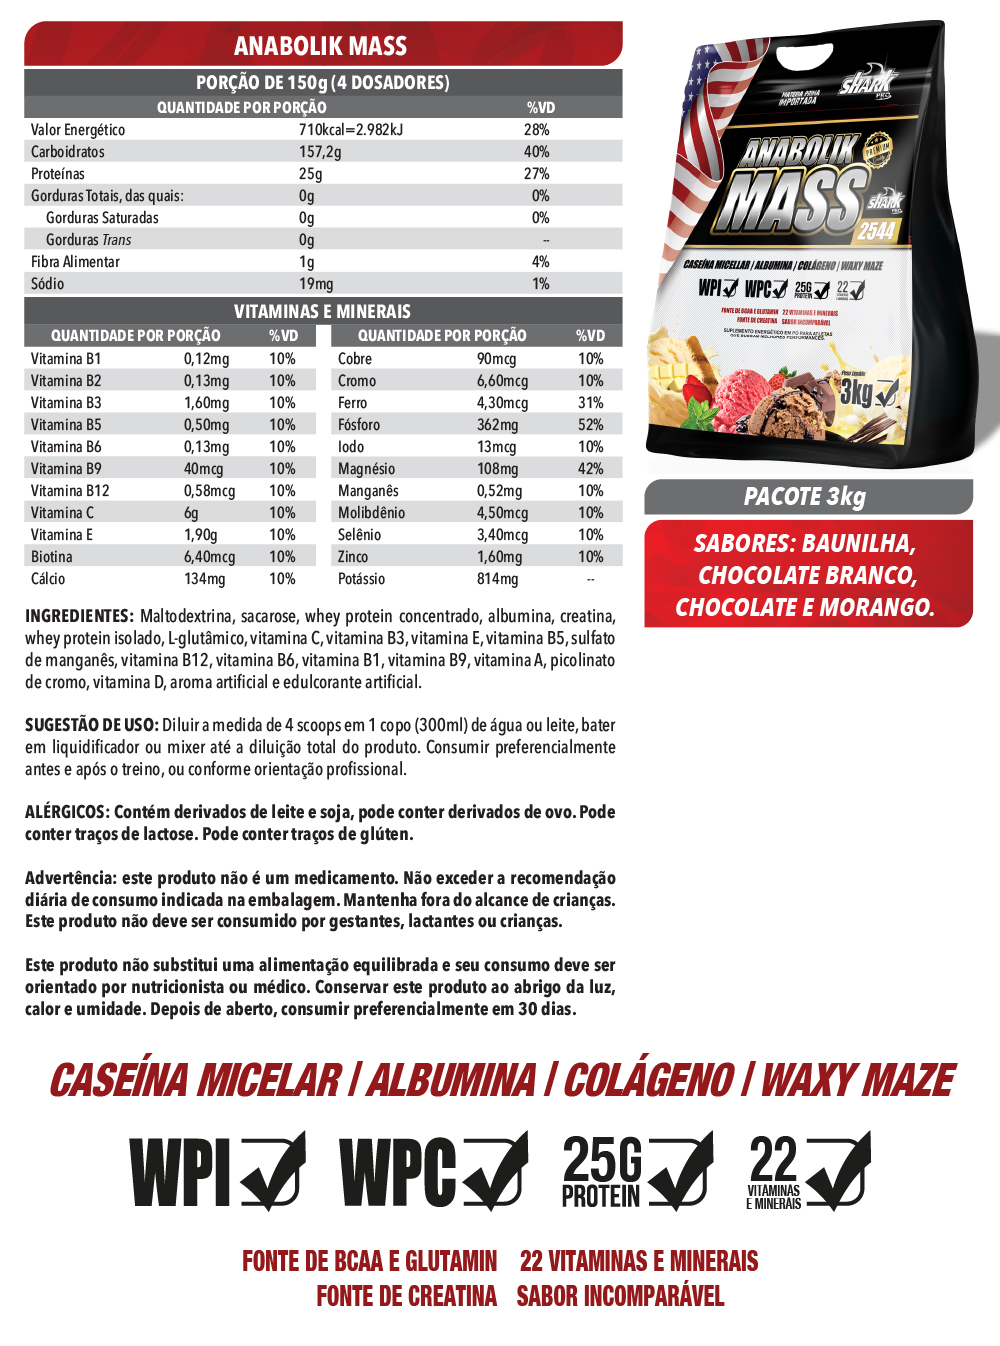 Anabolik Mass 3Kg - Chocolate Branco